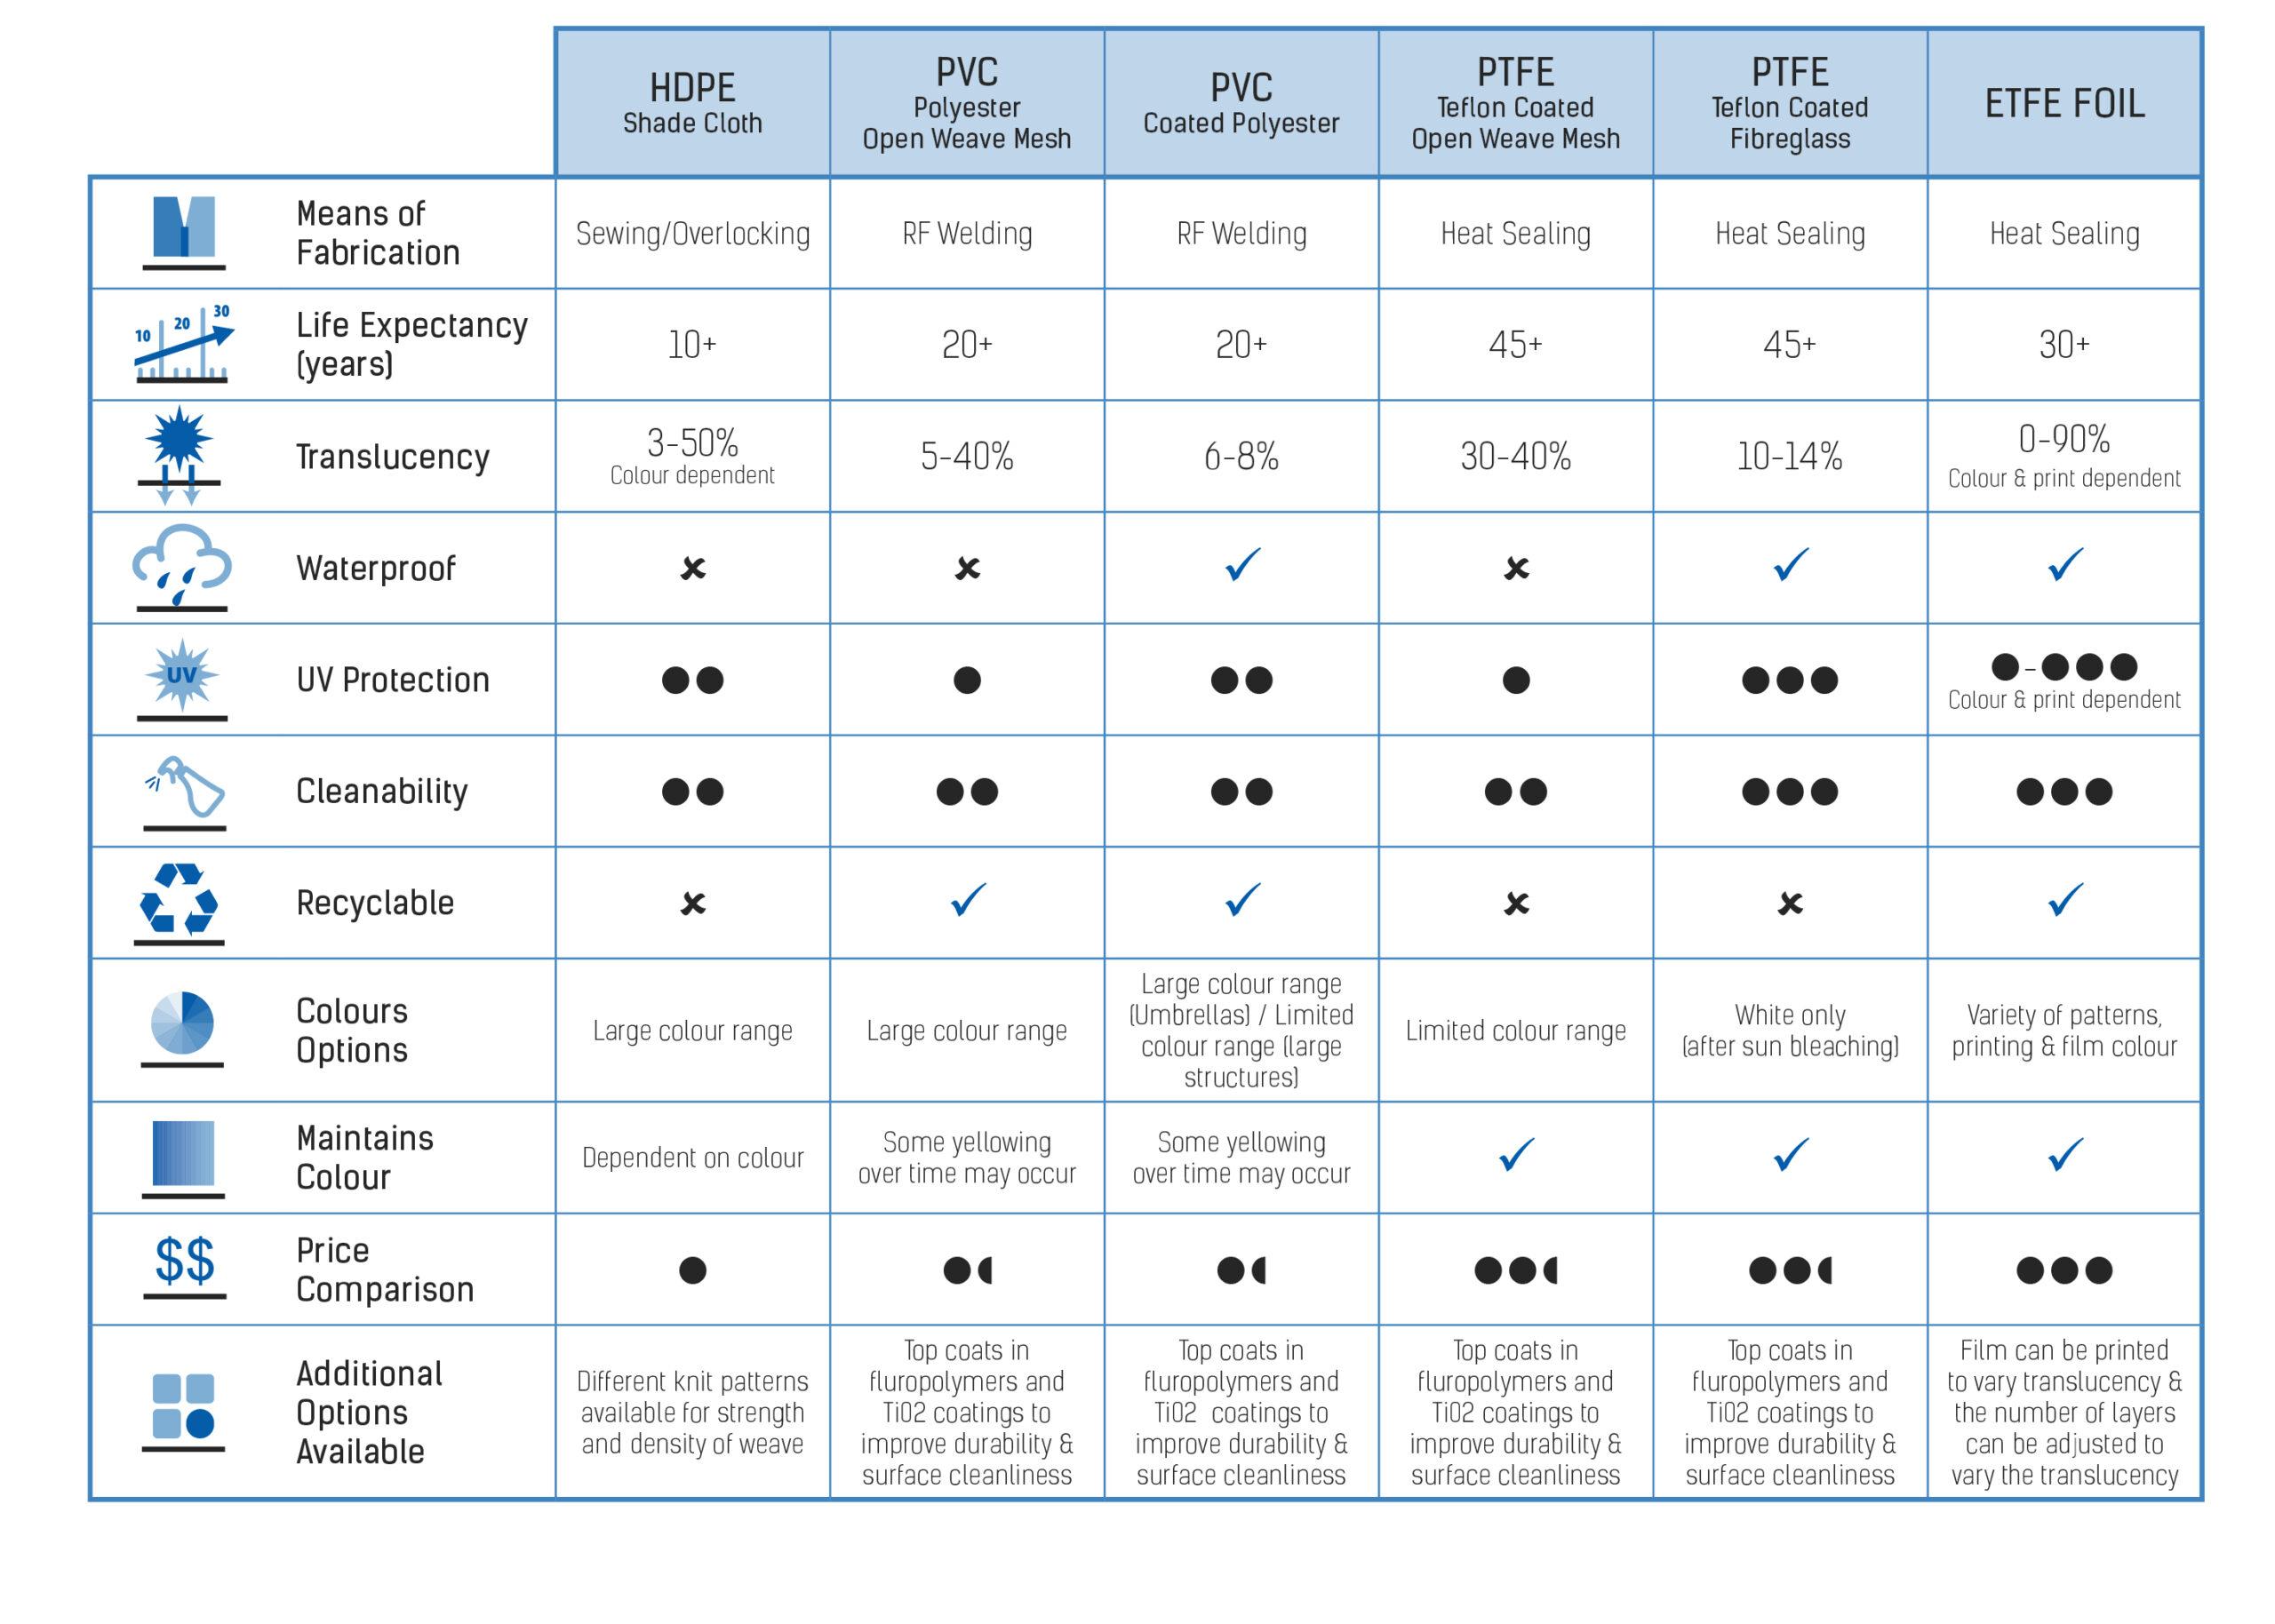 MakMax Fabric Comparison Chart